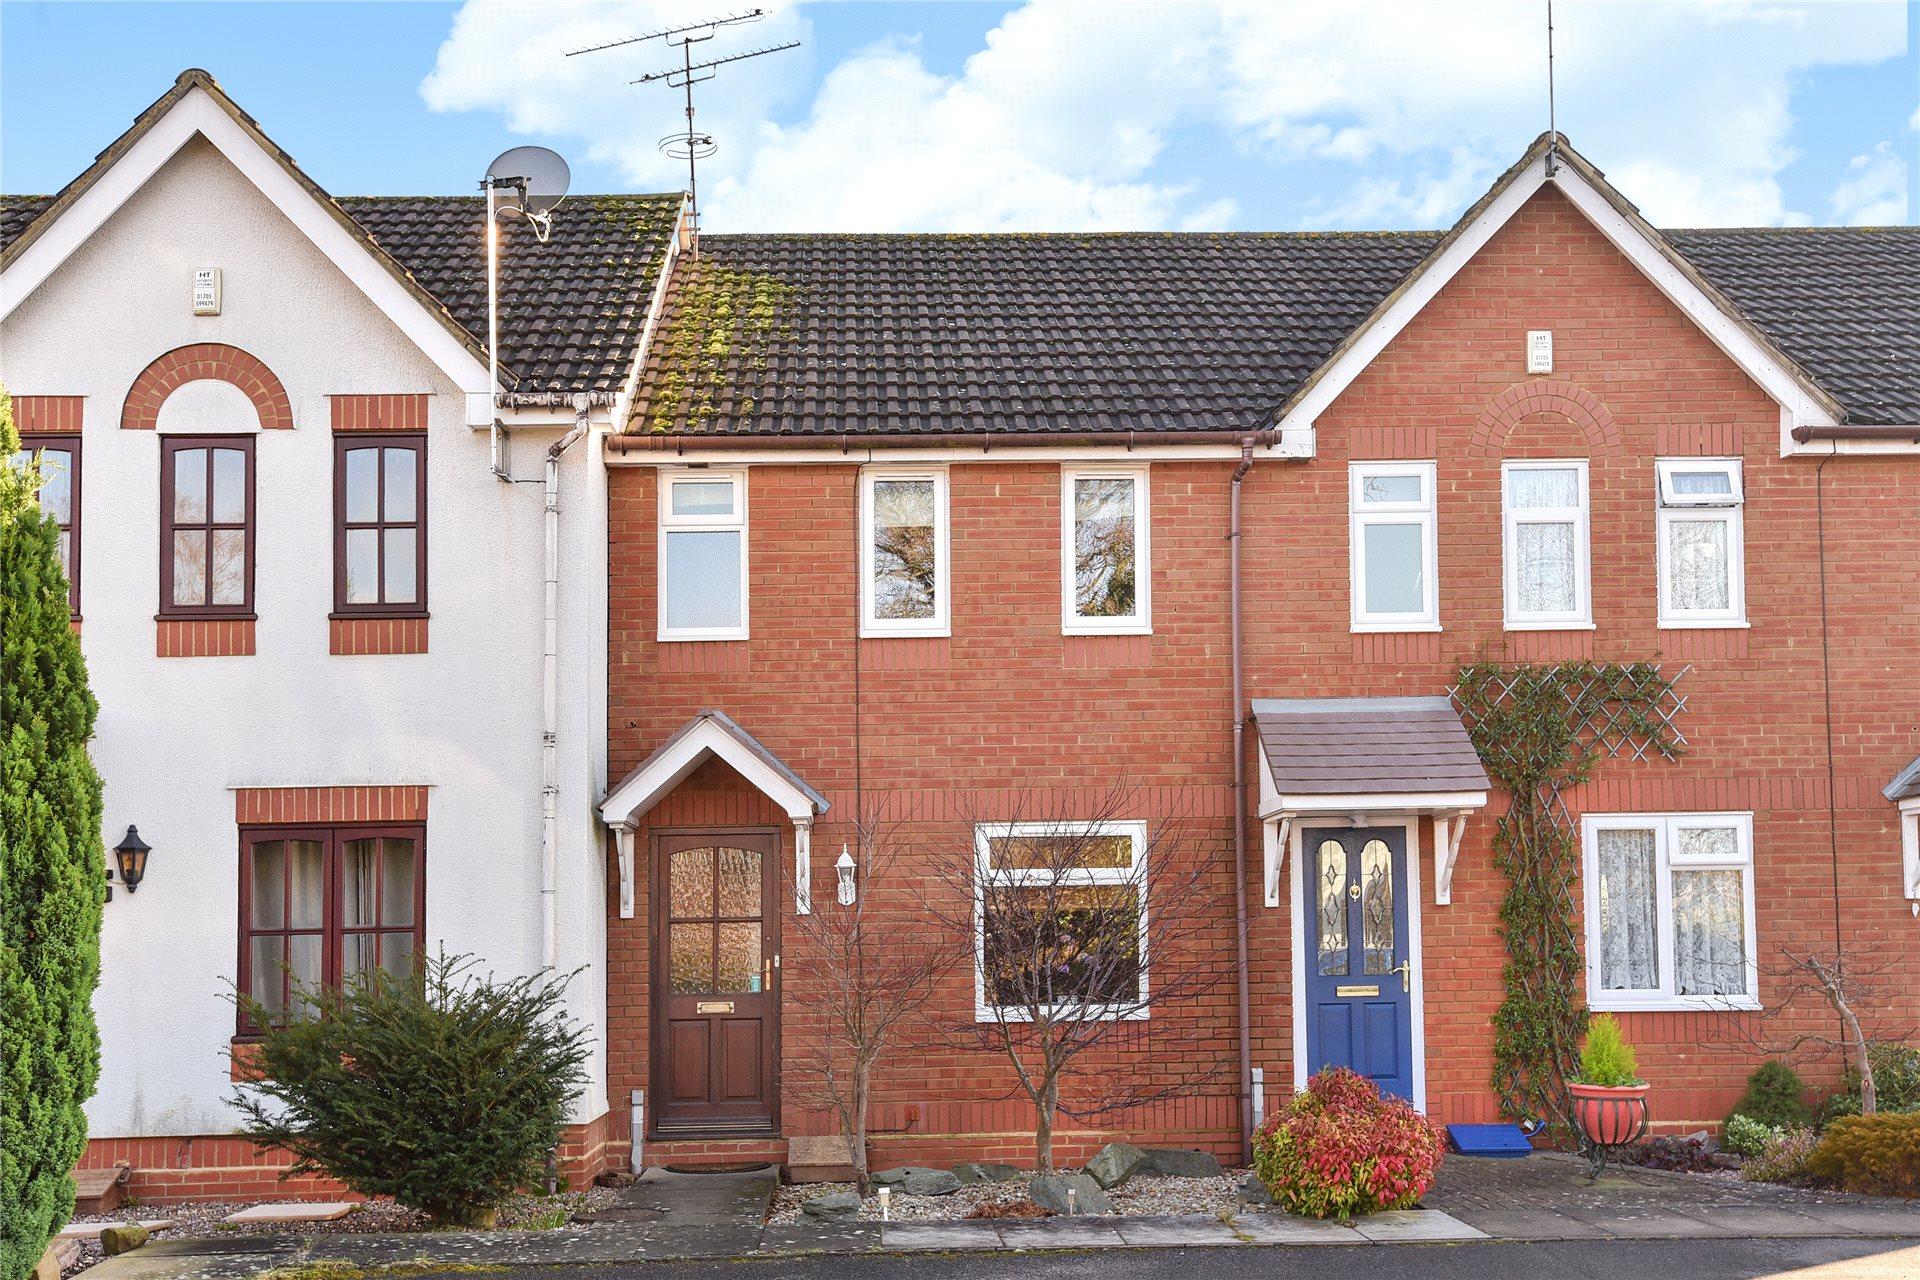 2 Bedrooms Terraced House for sale in Gower Park, College Town, Sandhurst, Berkshire, GU47